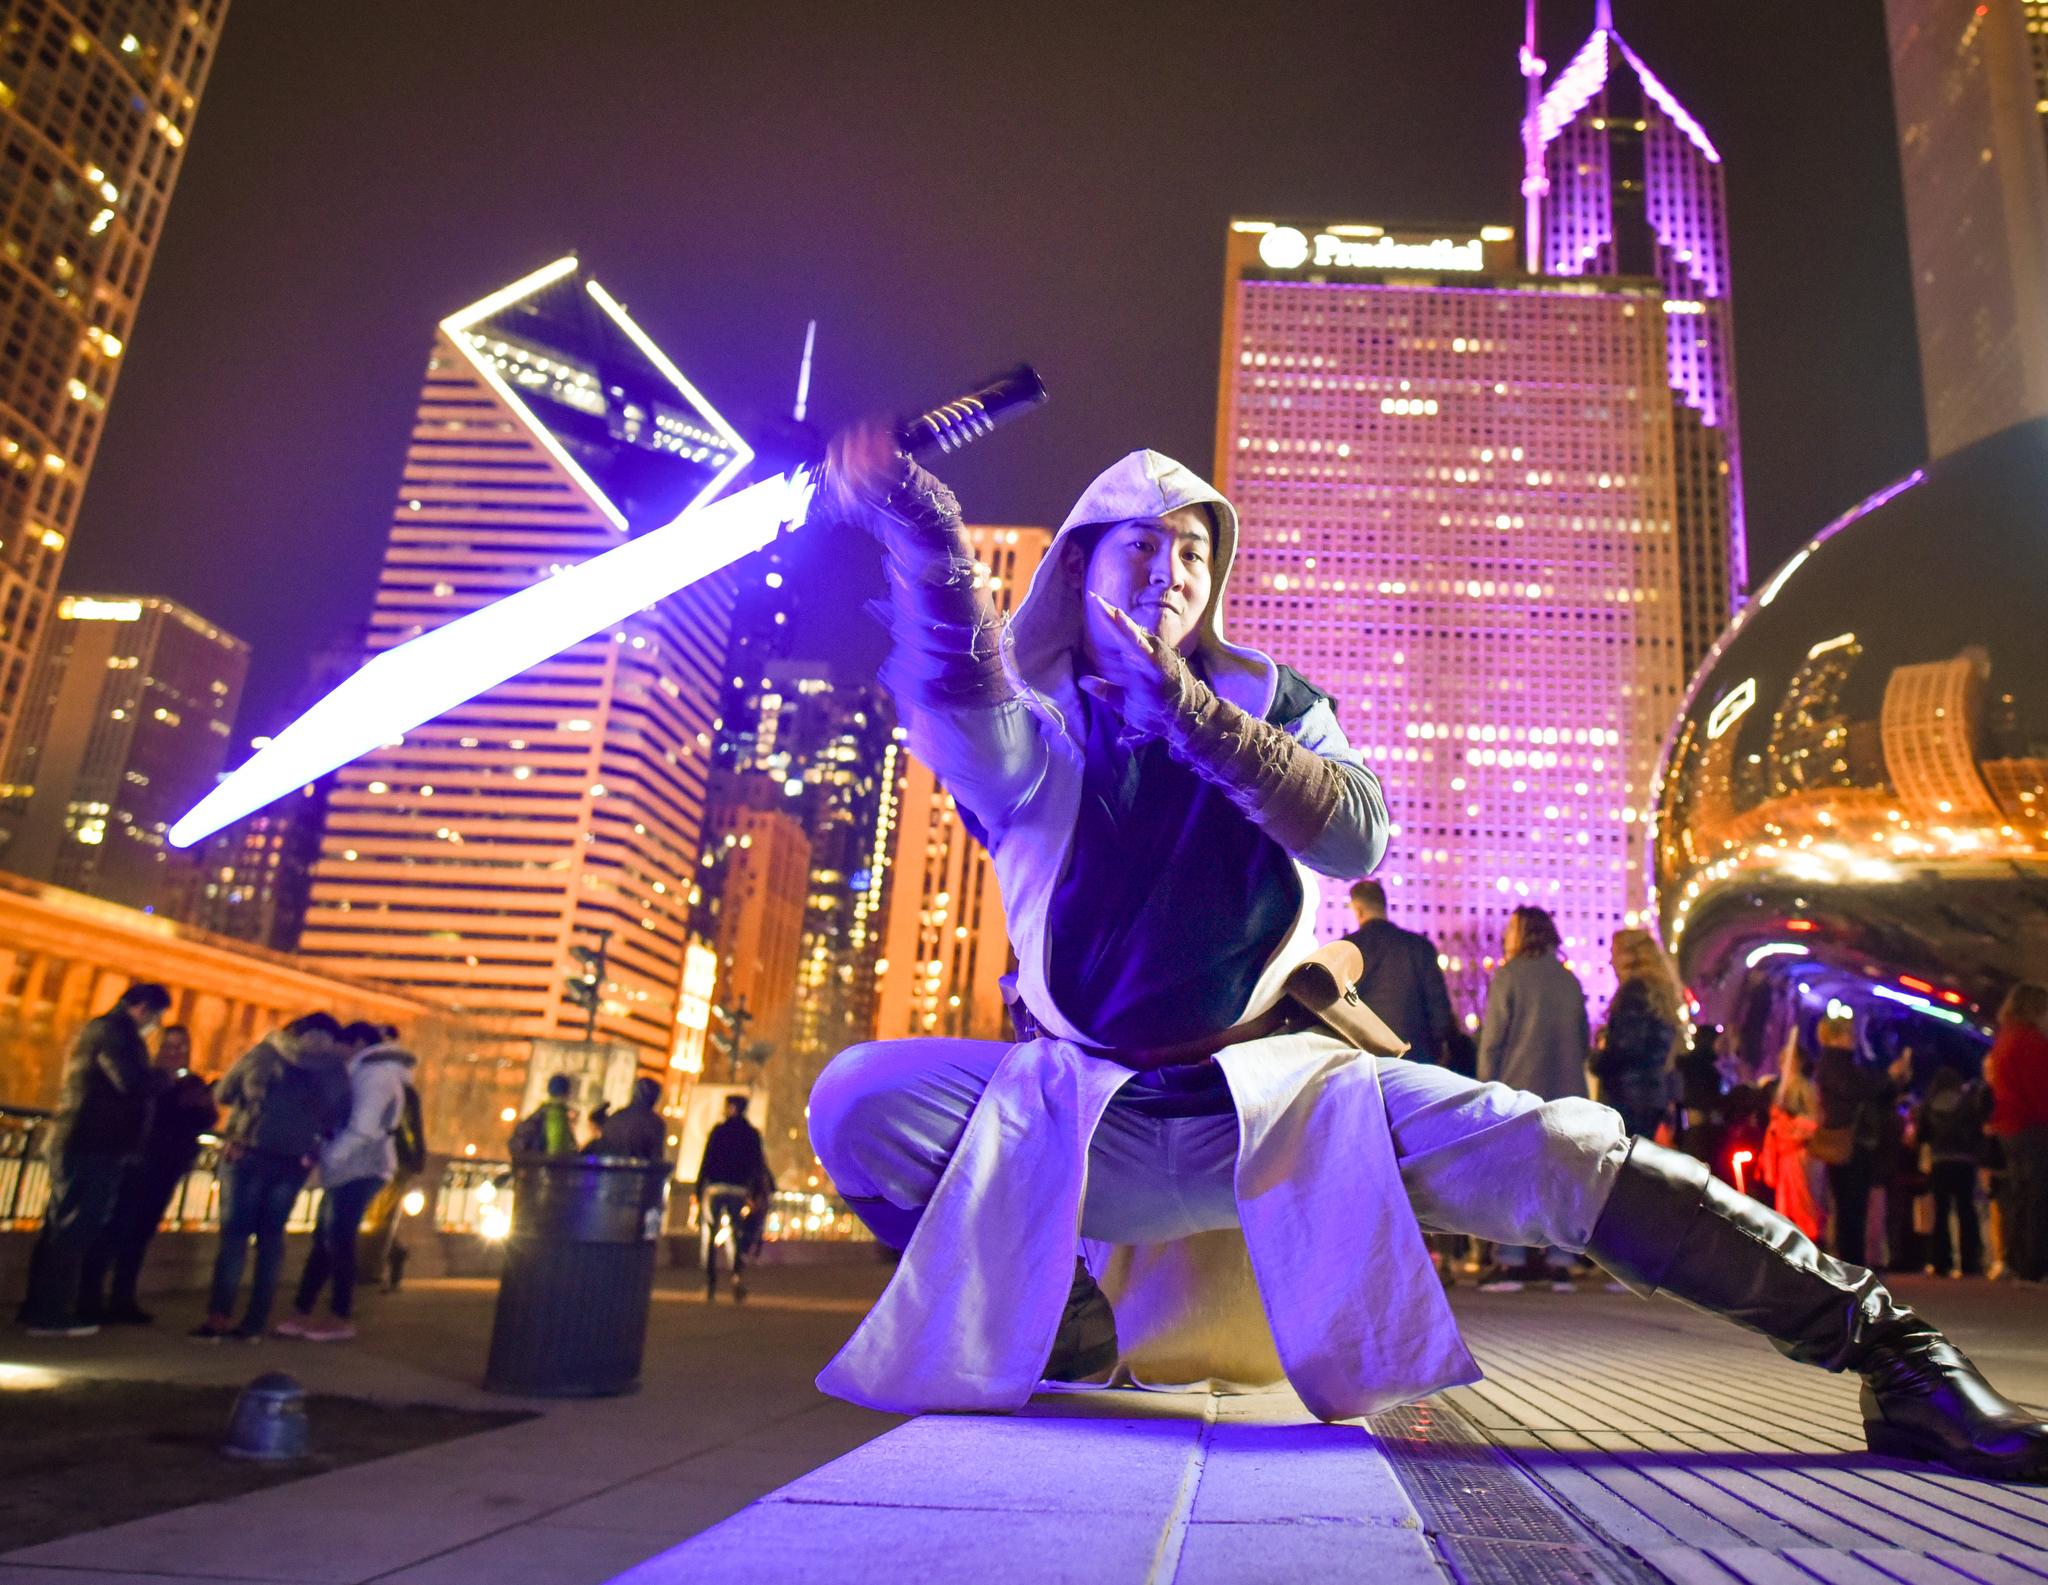 2019.04.14 - Star Wars Celebration Chicago 288885.JPG